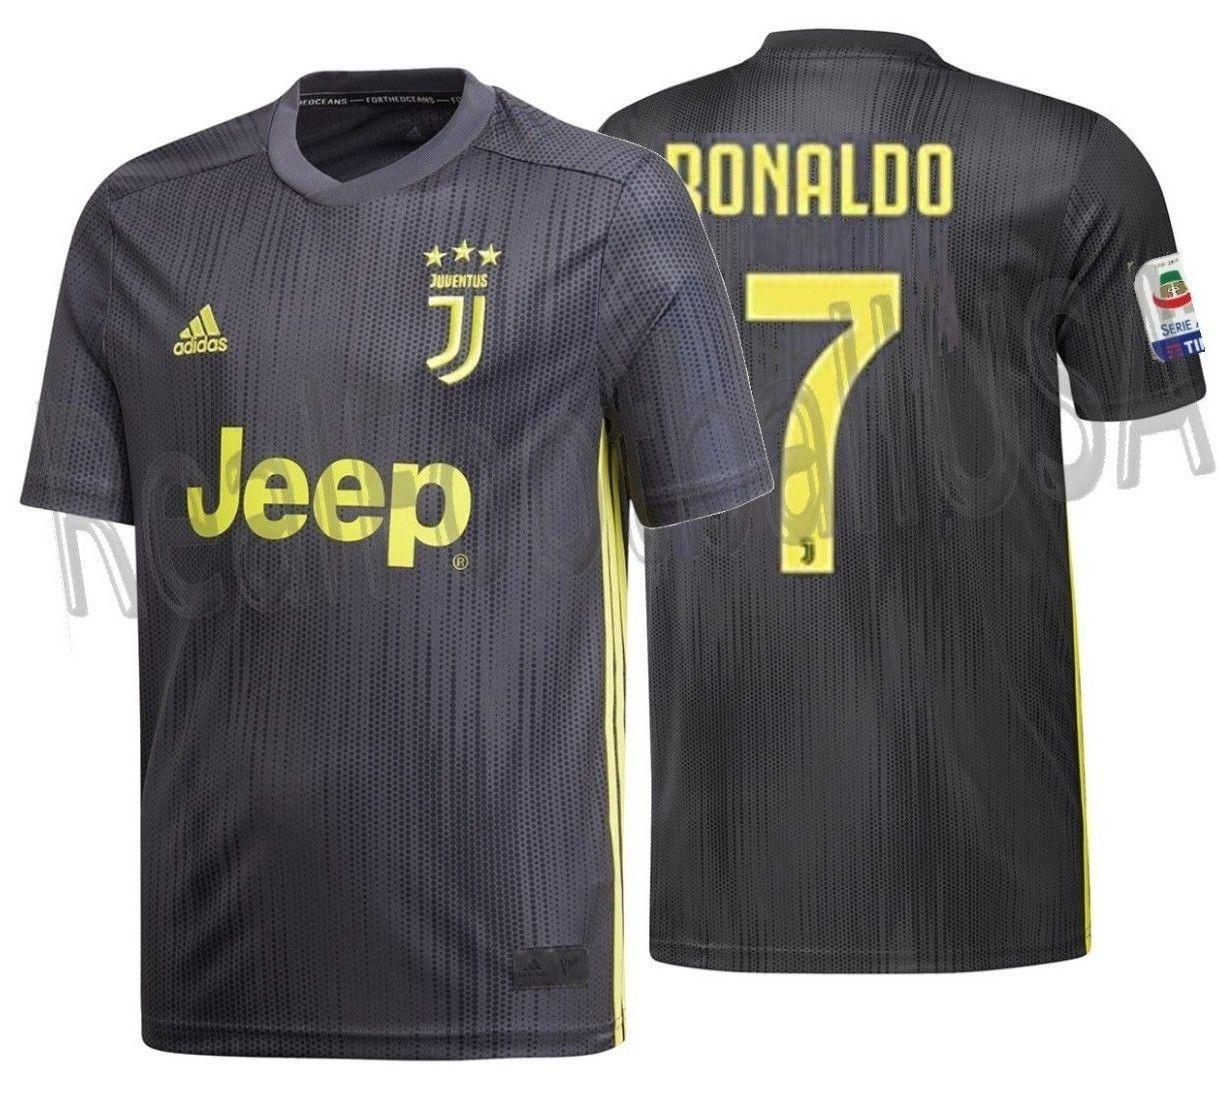 985861bfd Adidas Cristiano Ronaldo Juventus Third and similar items. 57